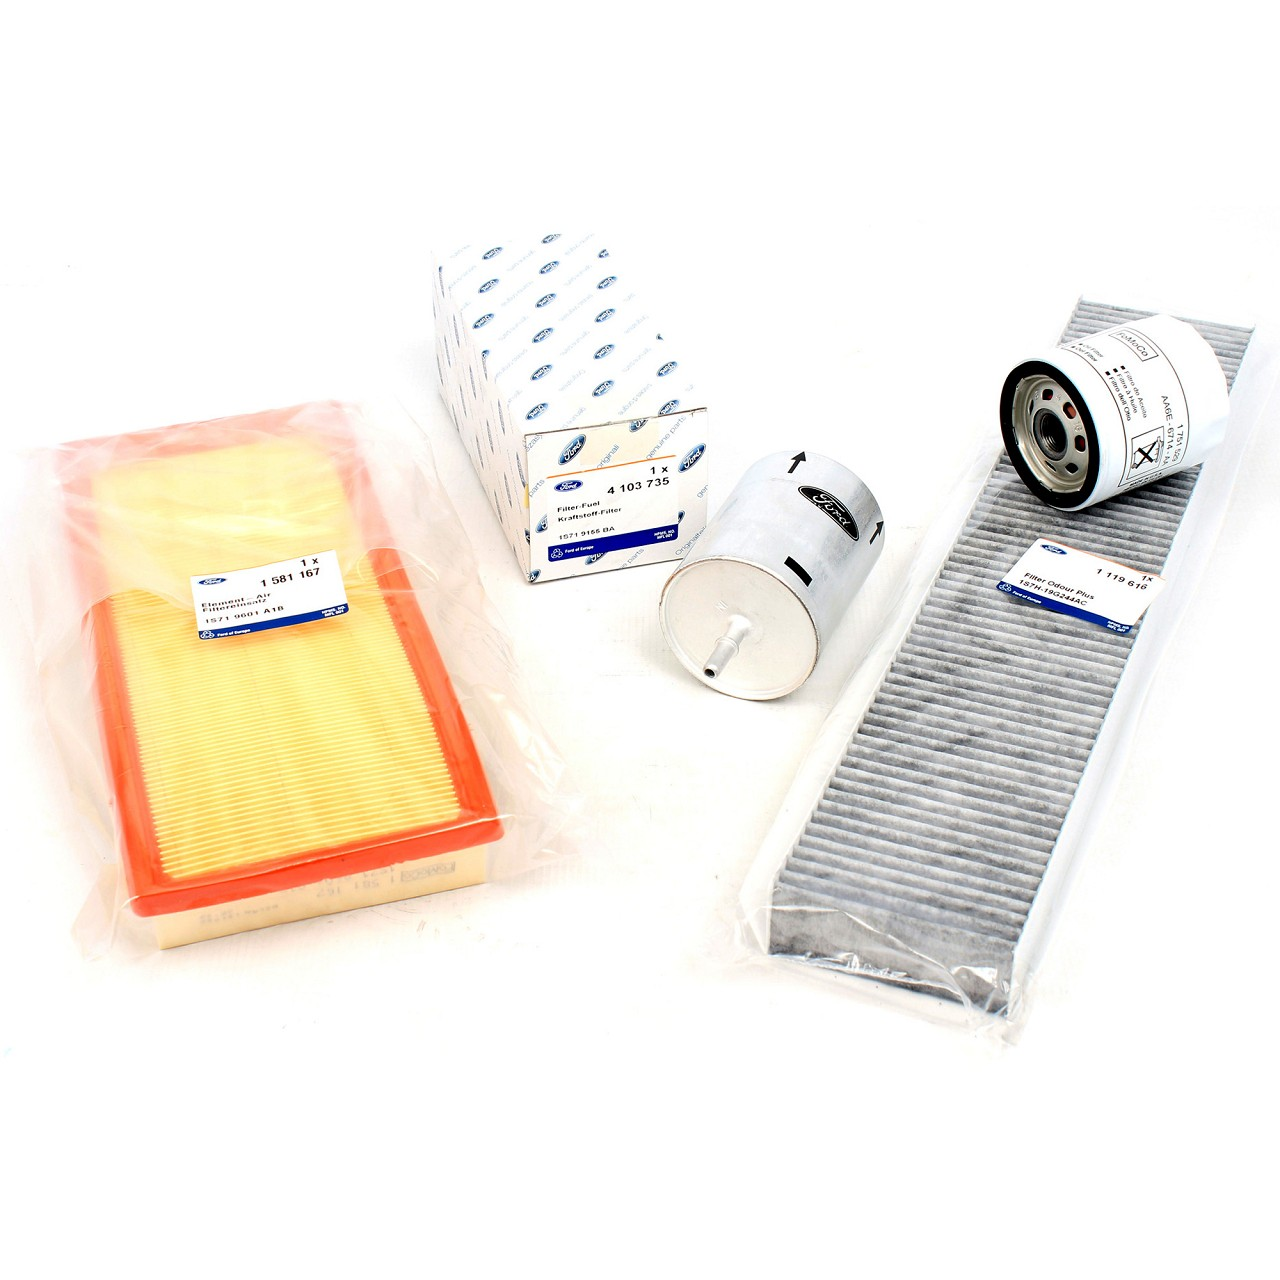 ORIGINAL Ford Inspektionskit Filterset für MONDEO MK3 1.8-2.0 16V ab Bj. 11/2002